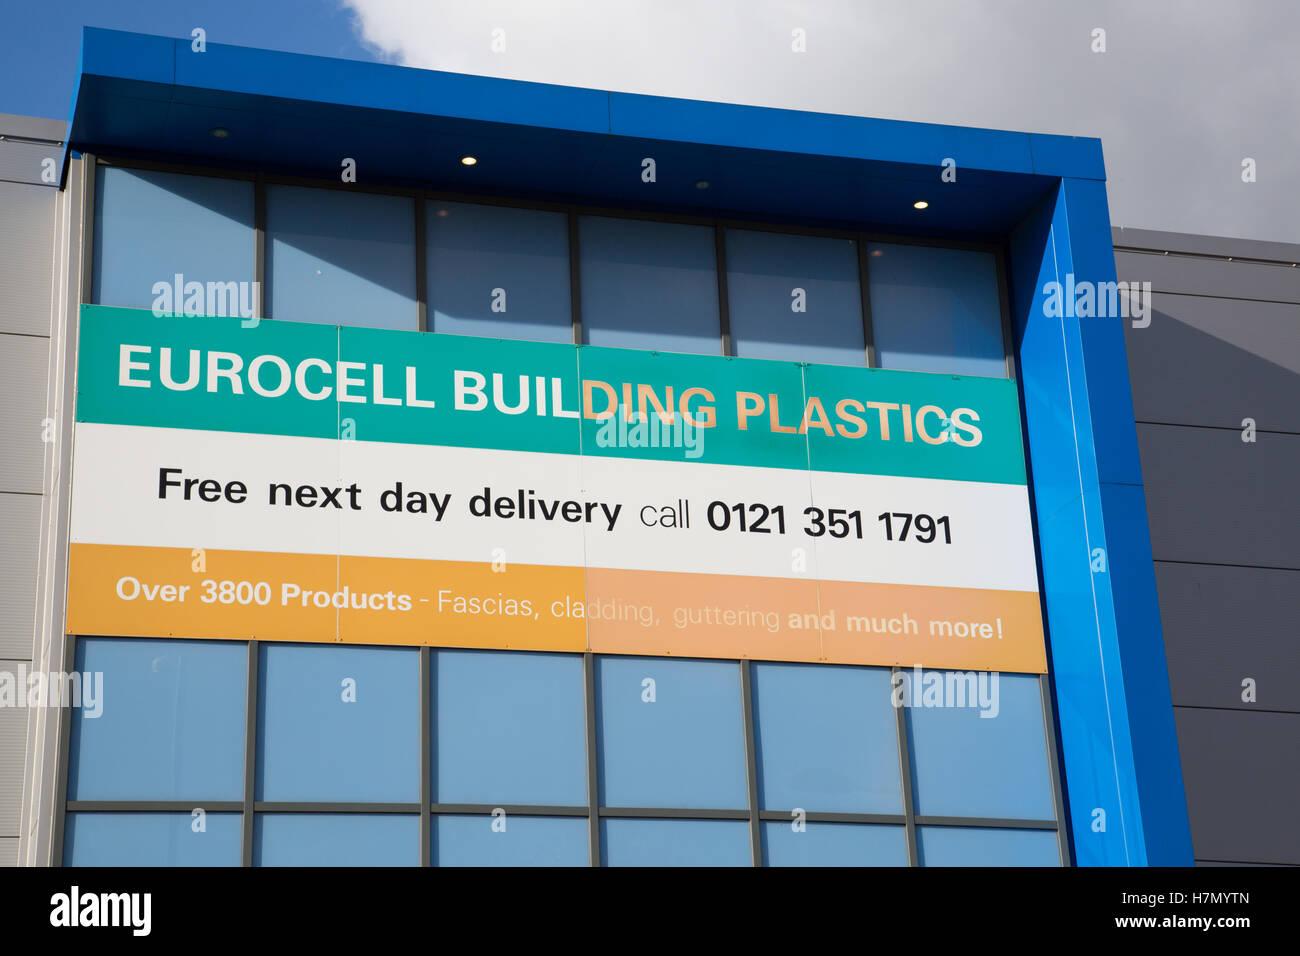 Eurocell Building Plastics trade centre signage - Stock Image